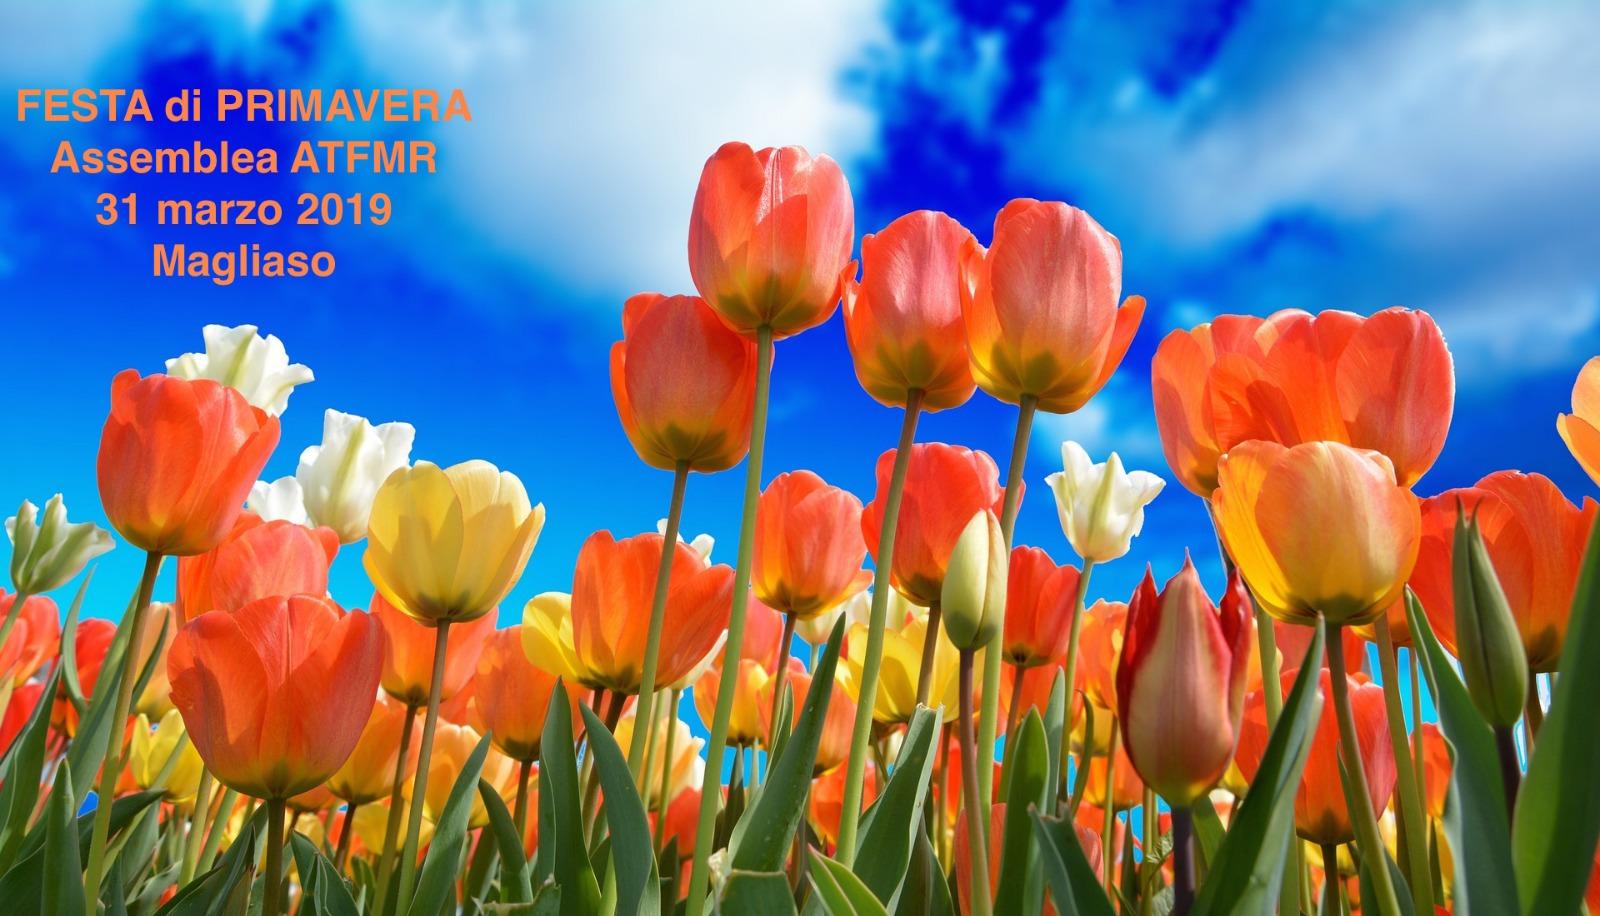 Festa di primavera ATFMR